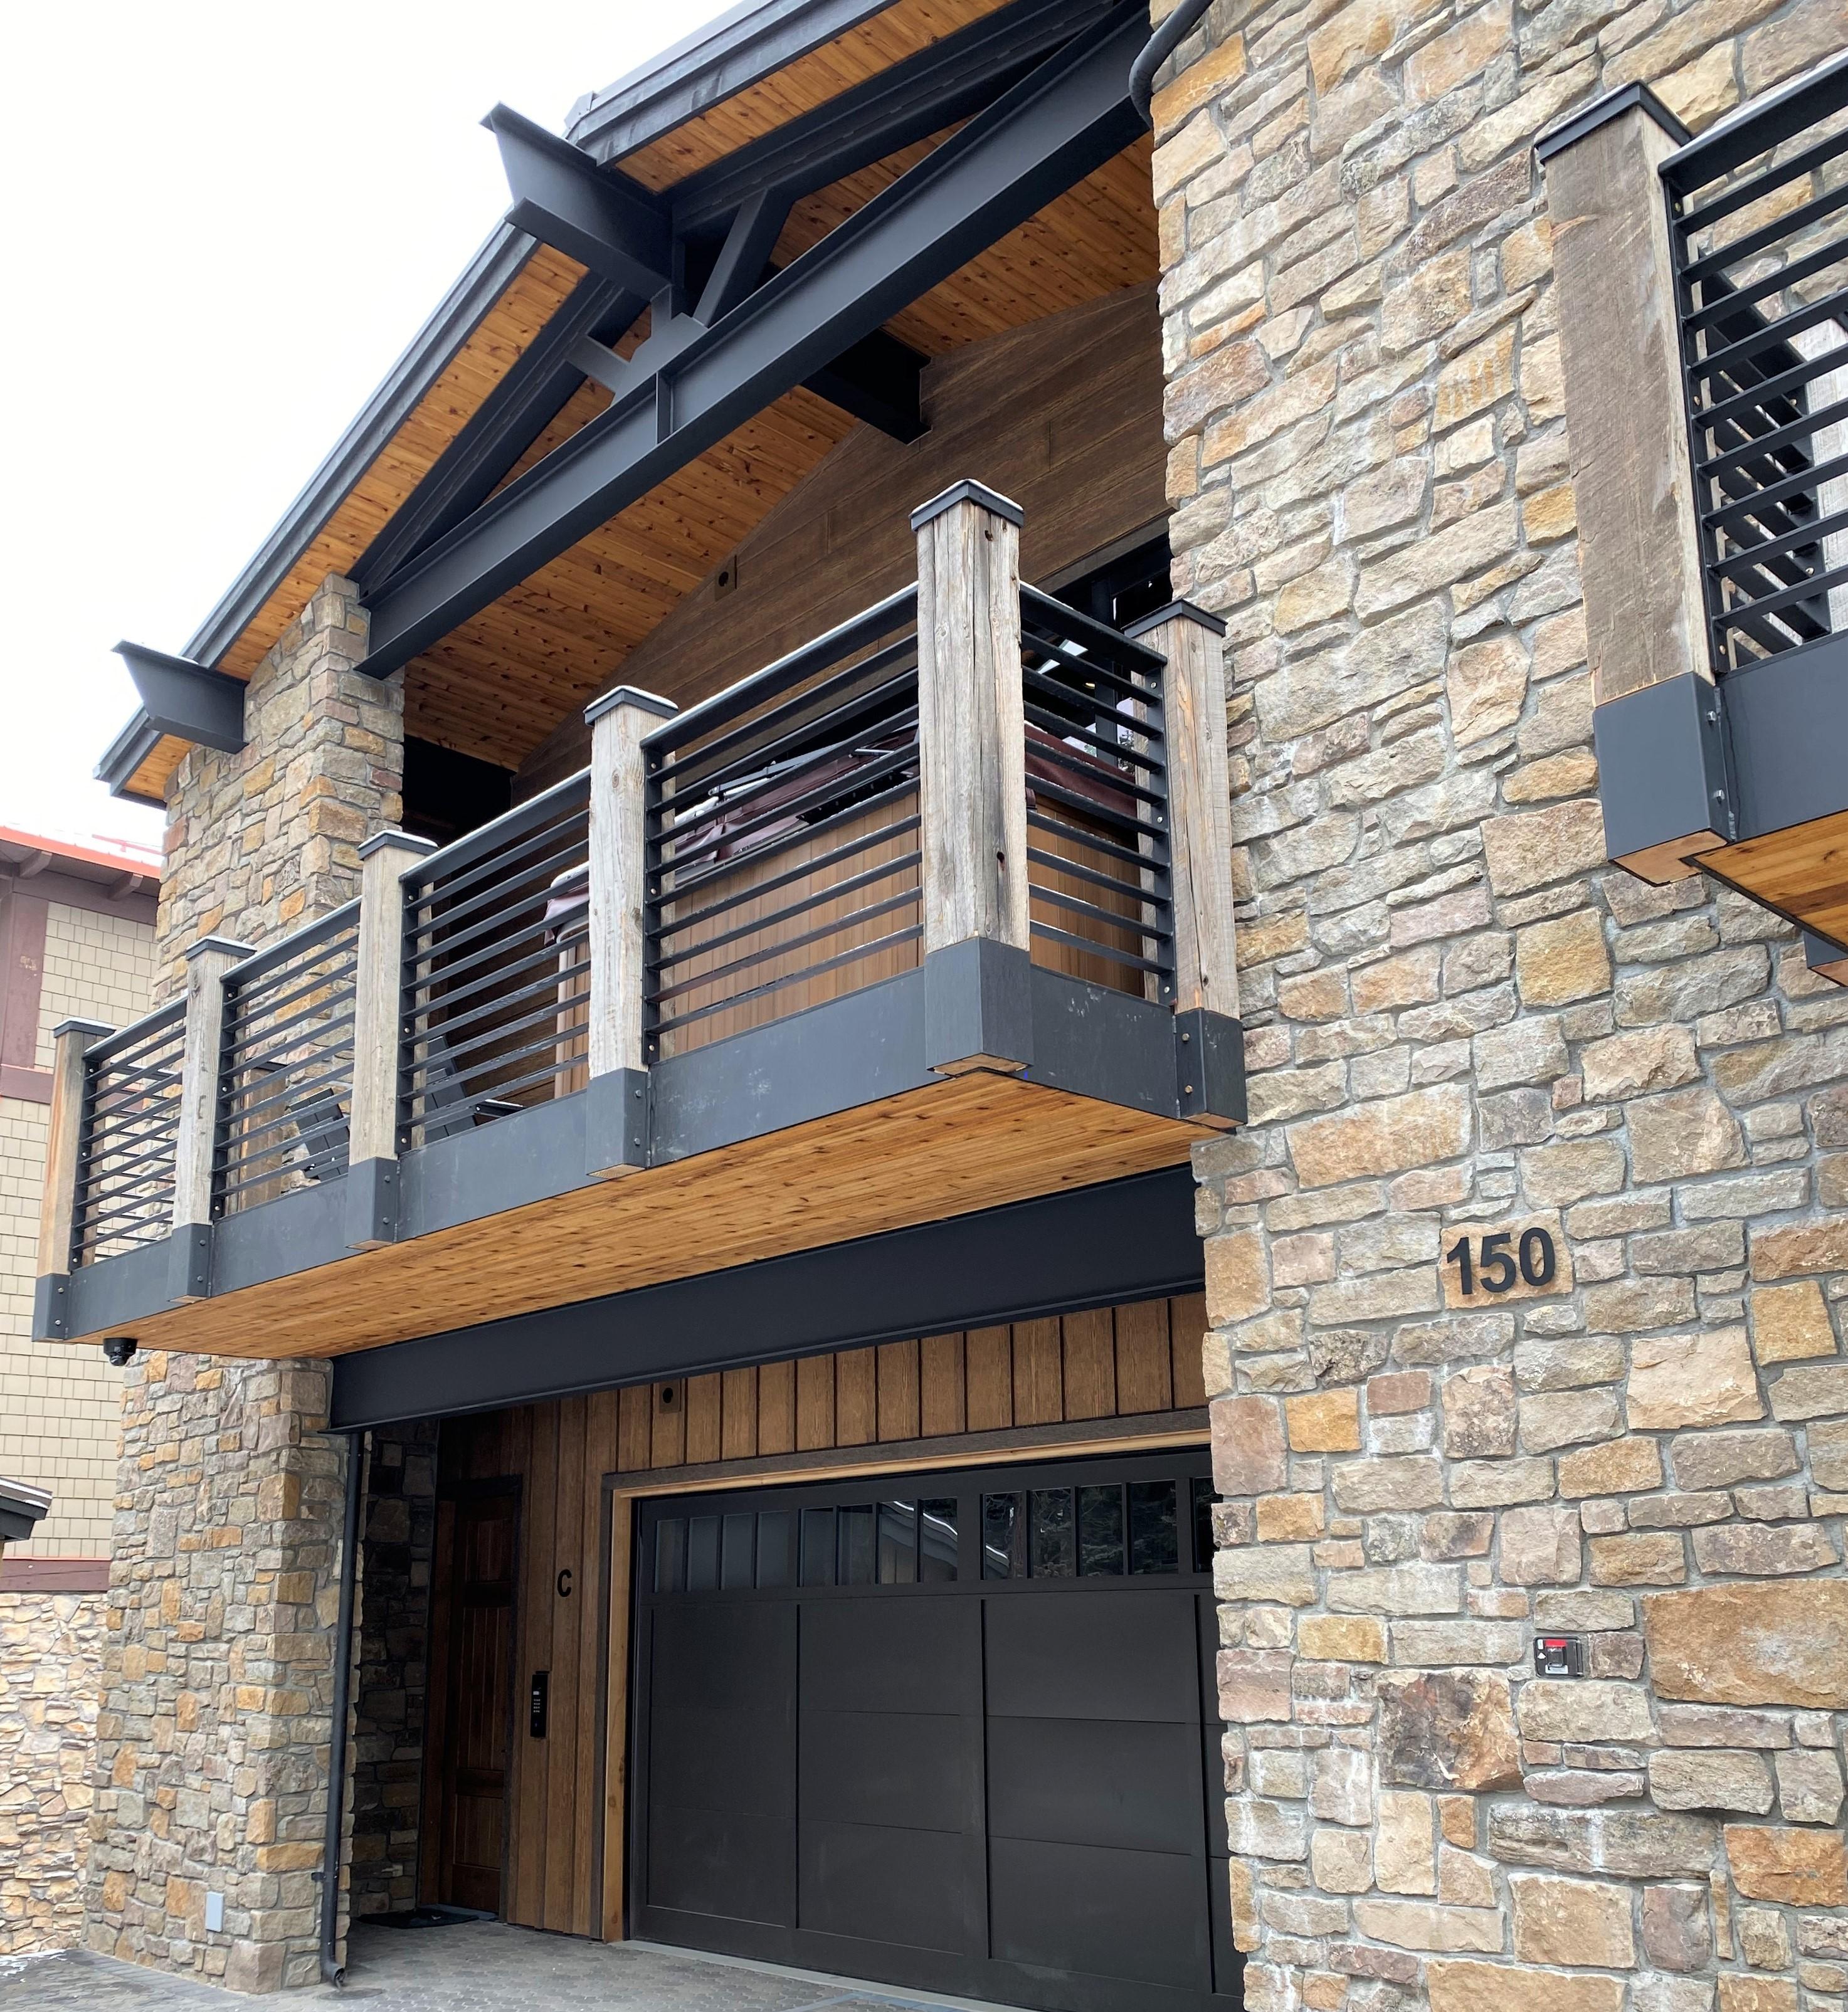 150 Hillside Drive Hillside Highlands Front Exterior